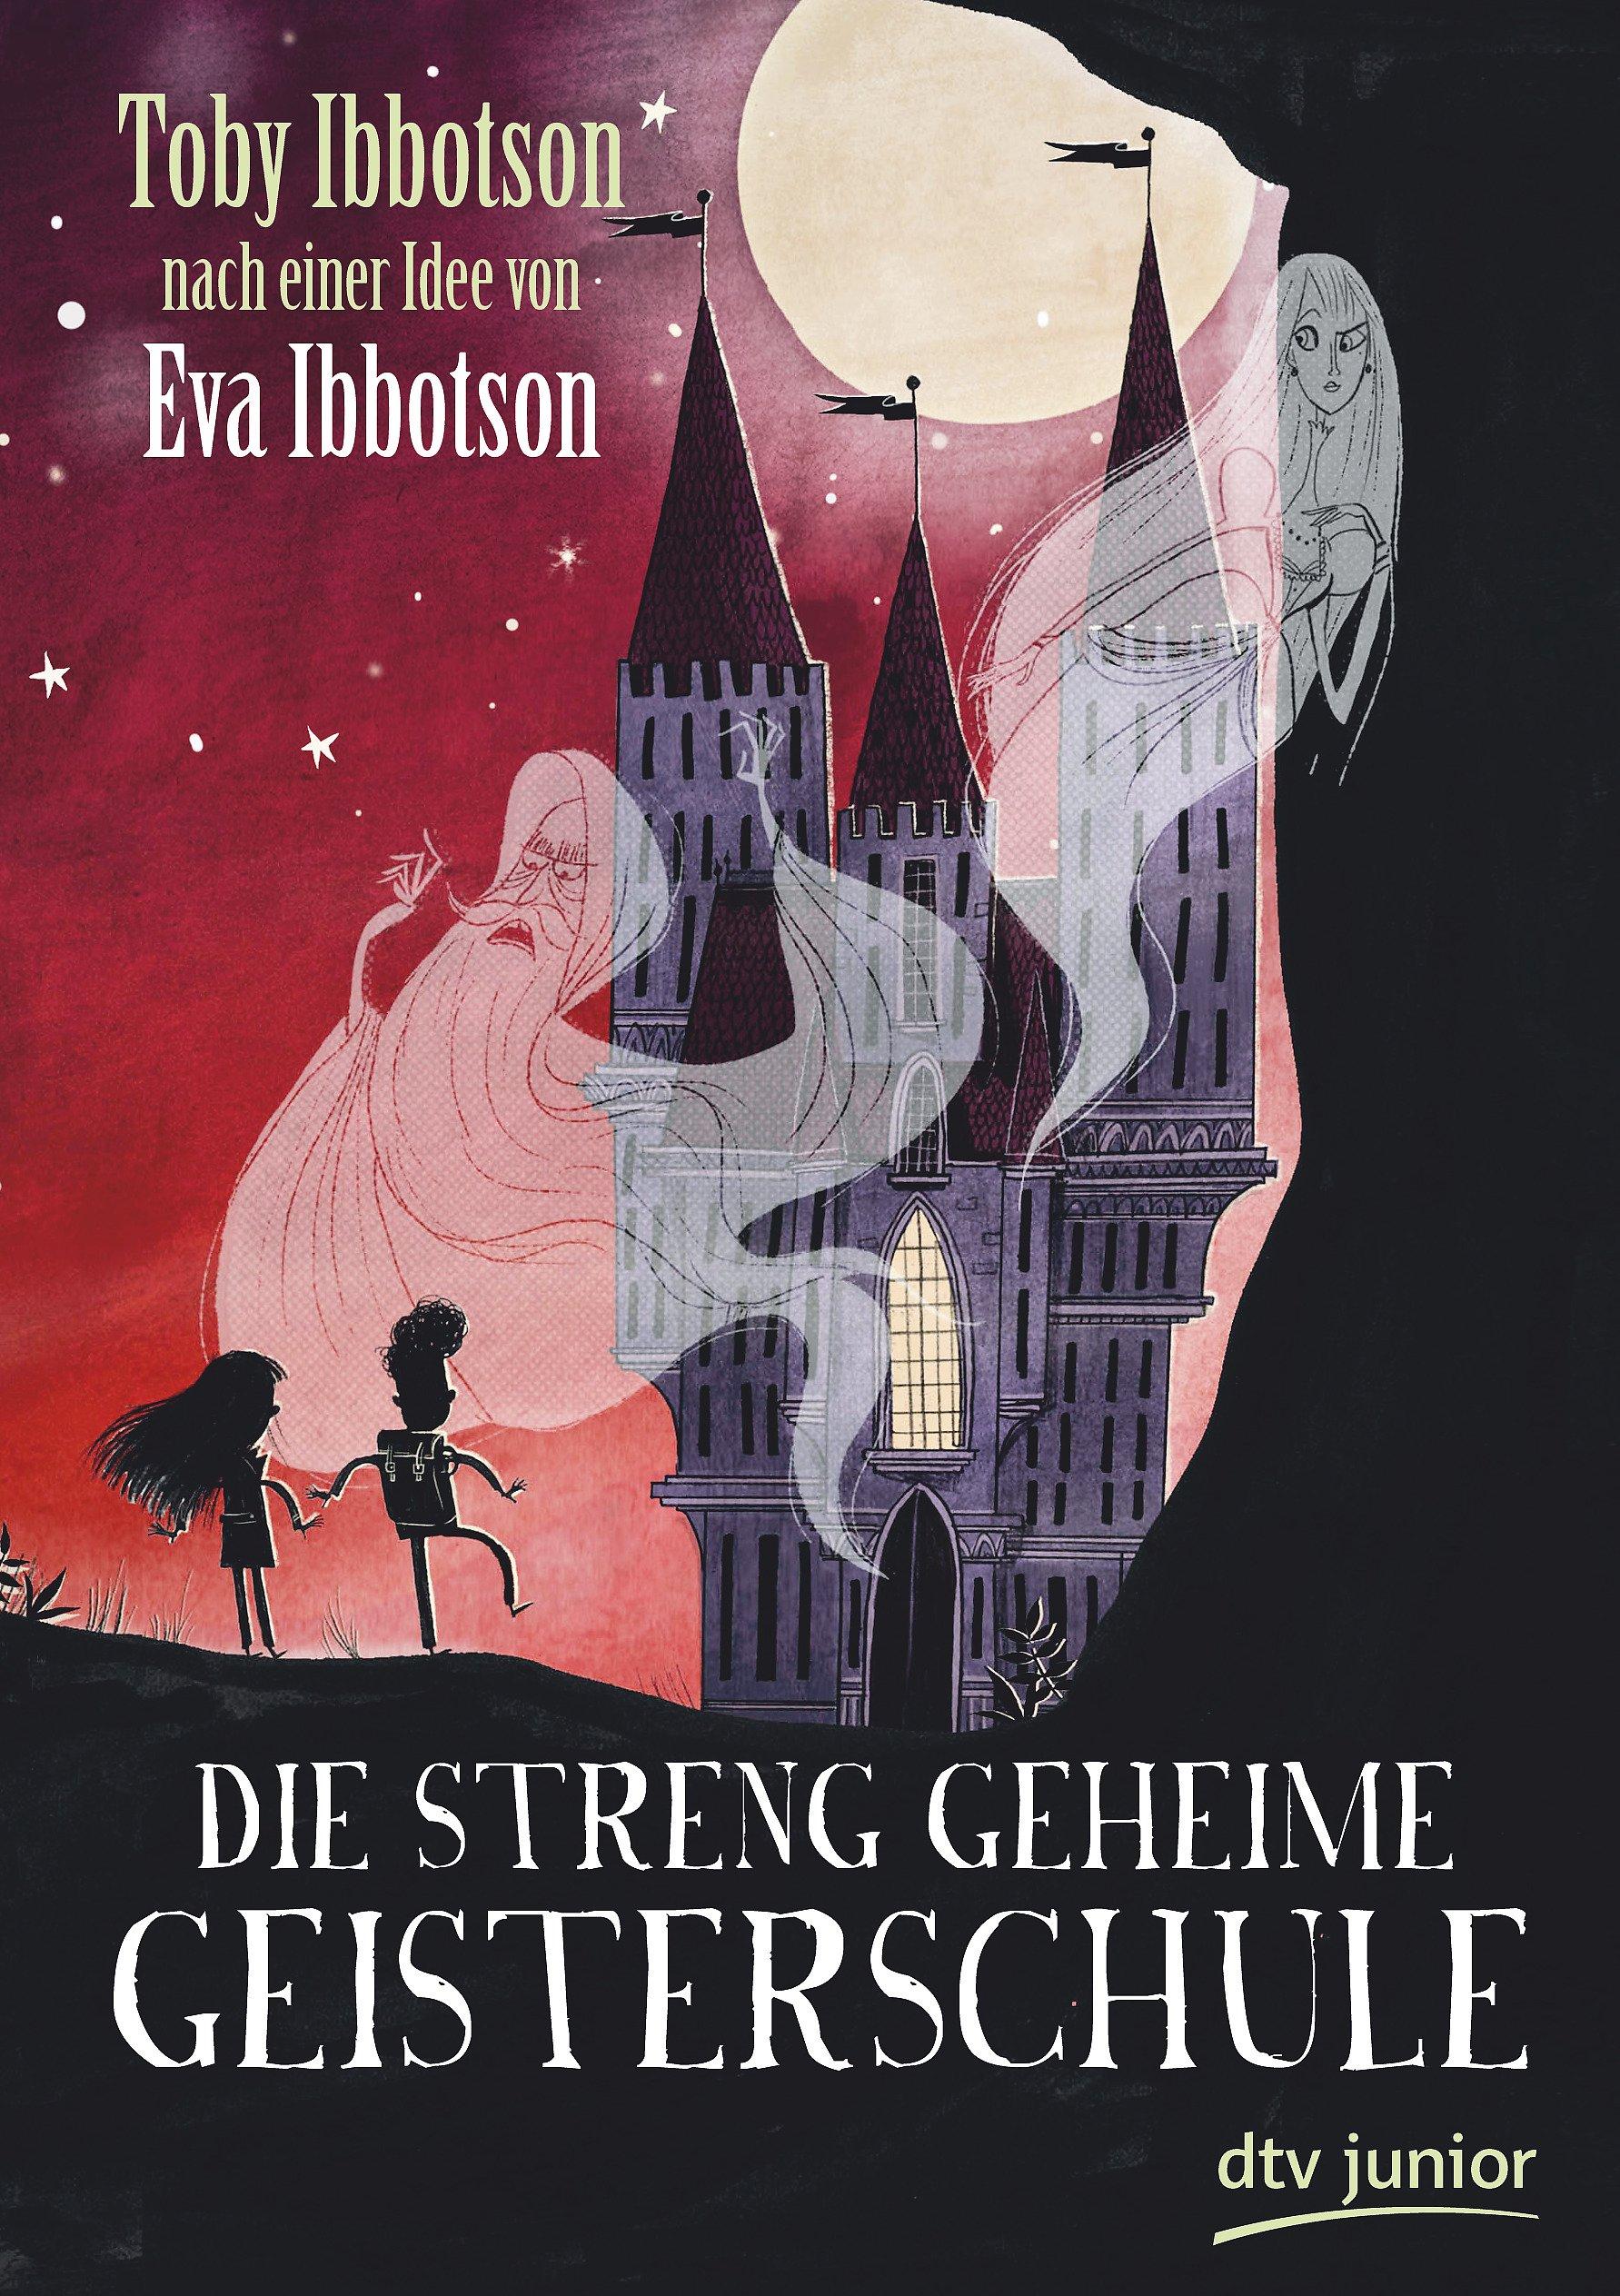 Die streng geheime Geisterschule: Amazon.de: Toby Ibbotson, Peter ...